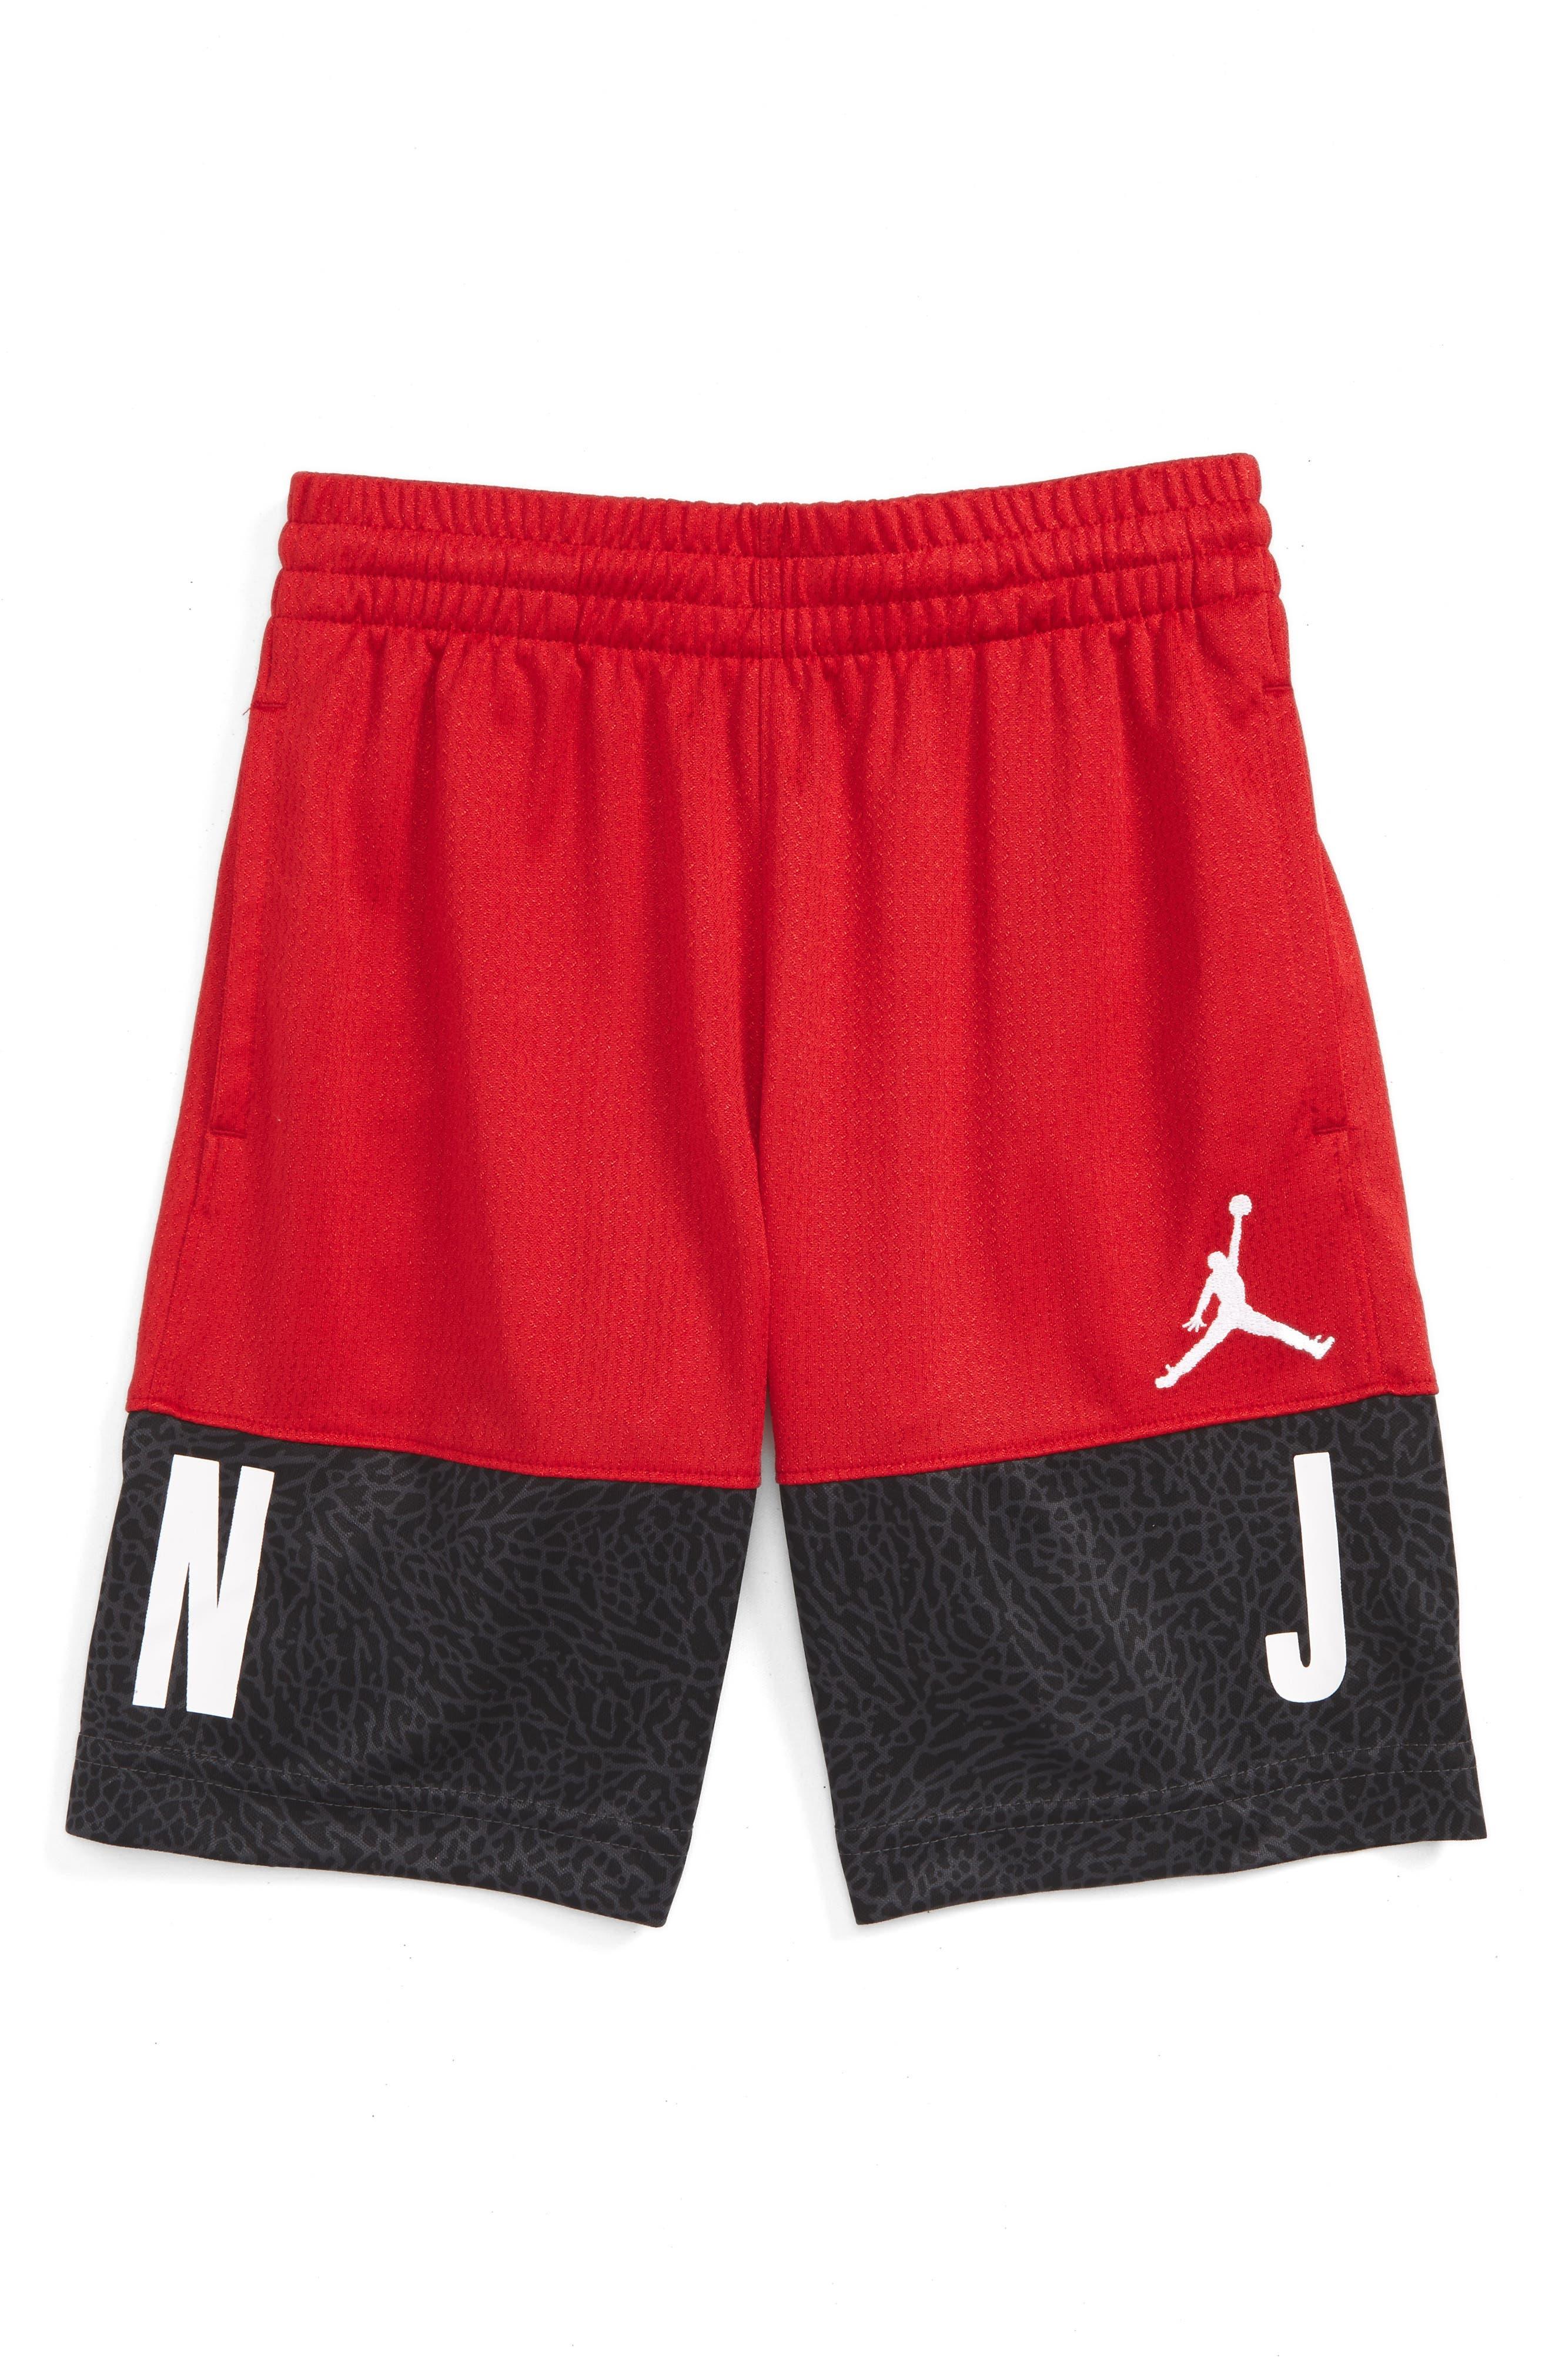 Jordan Air Jordan Blockout Shorts (Toddler Boys & Little Boys)